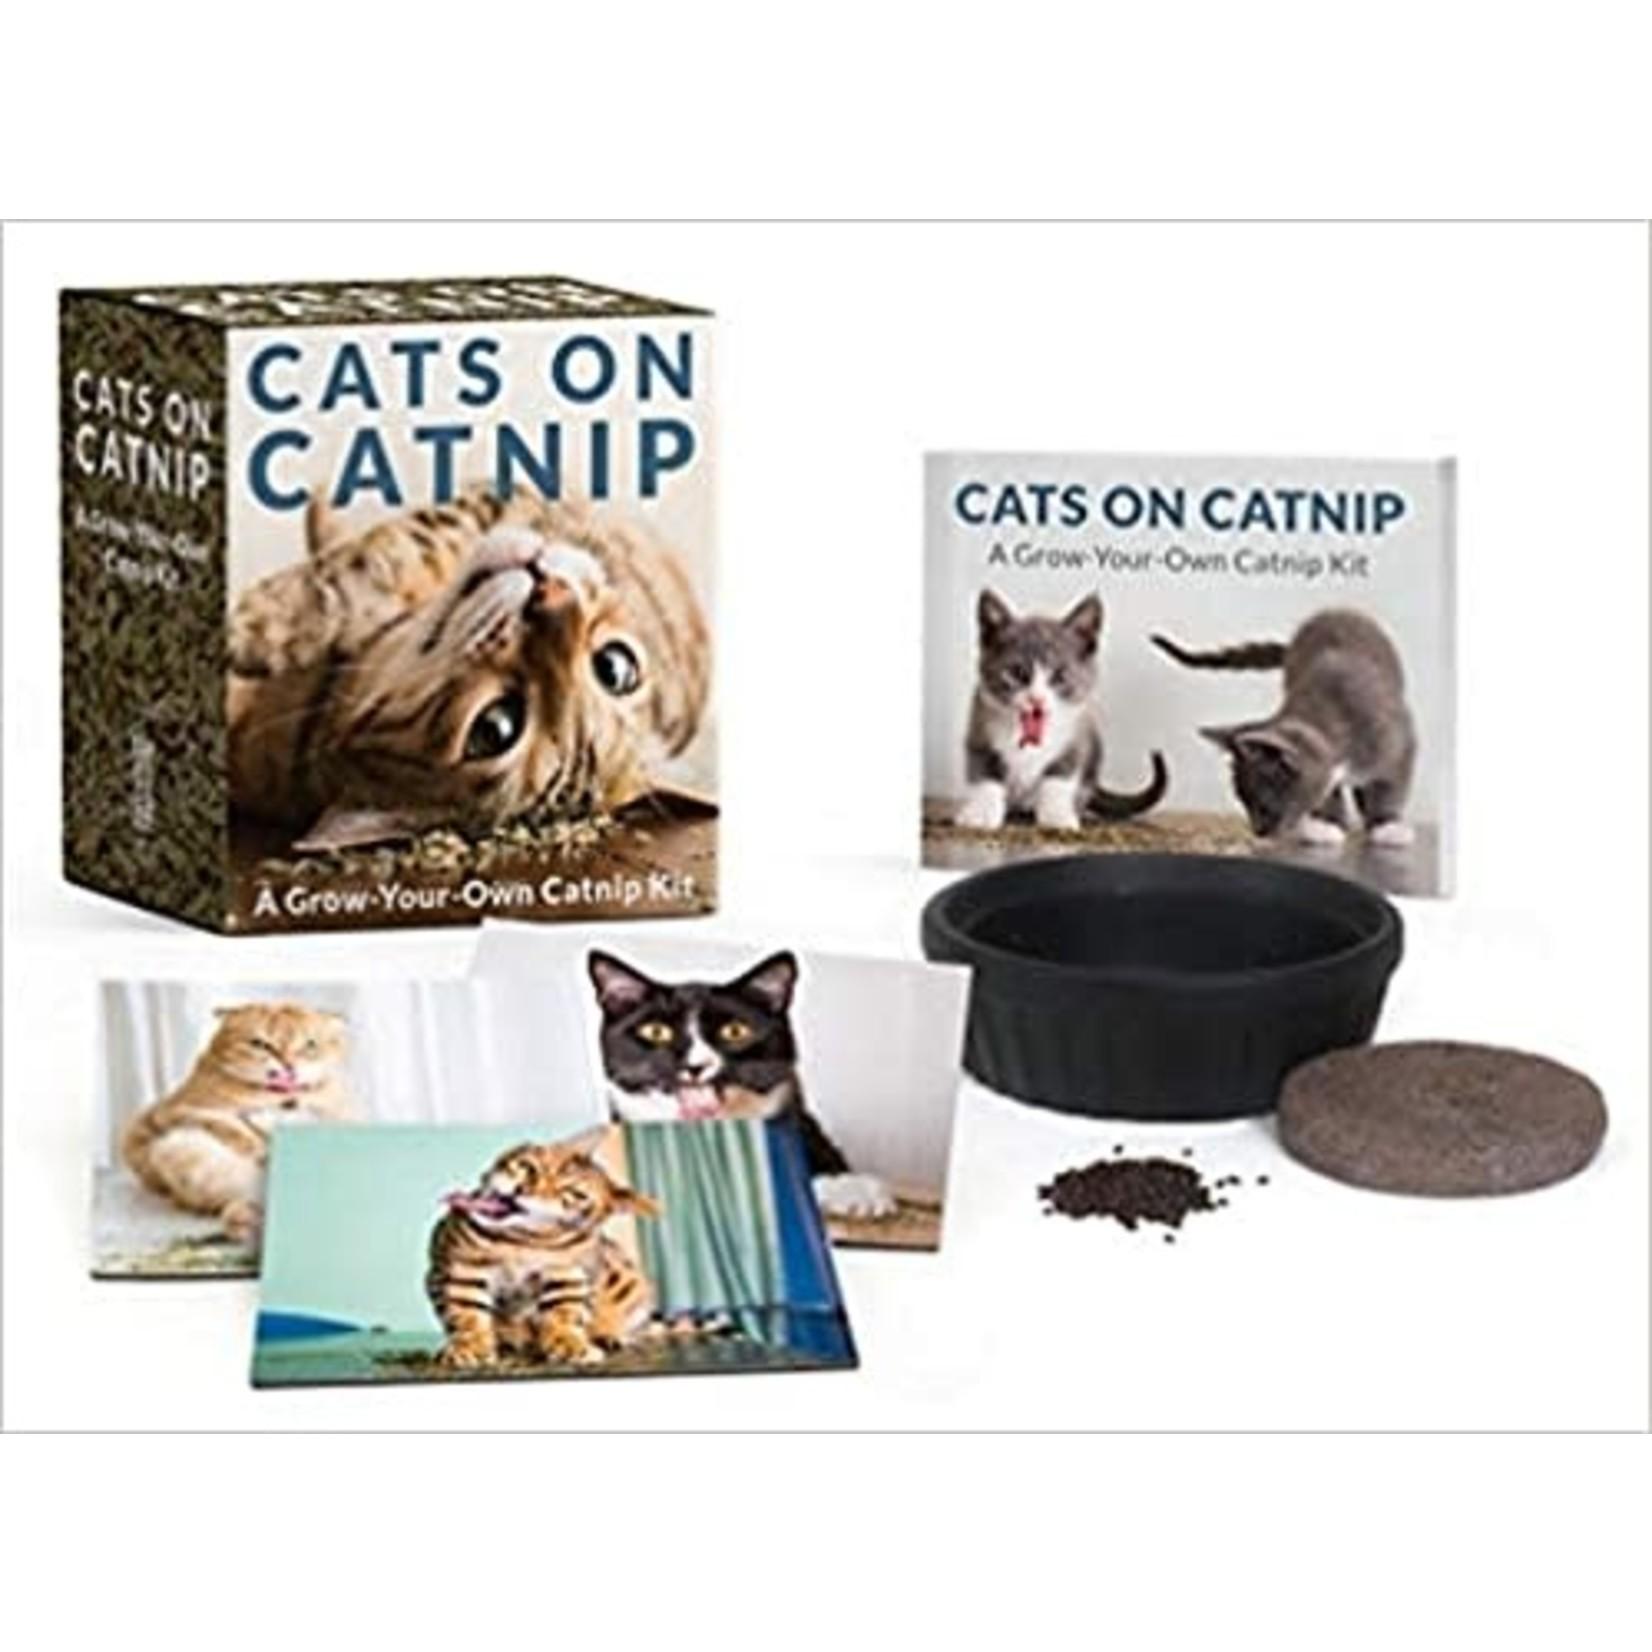 Catnip Kit - Cats on Catnip Tiny Gift Set